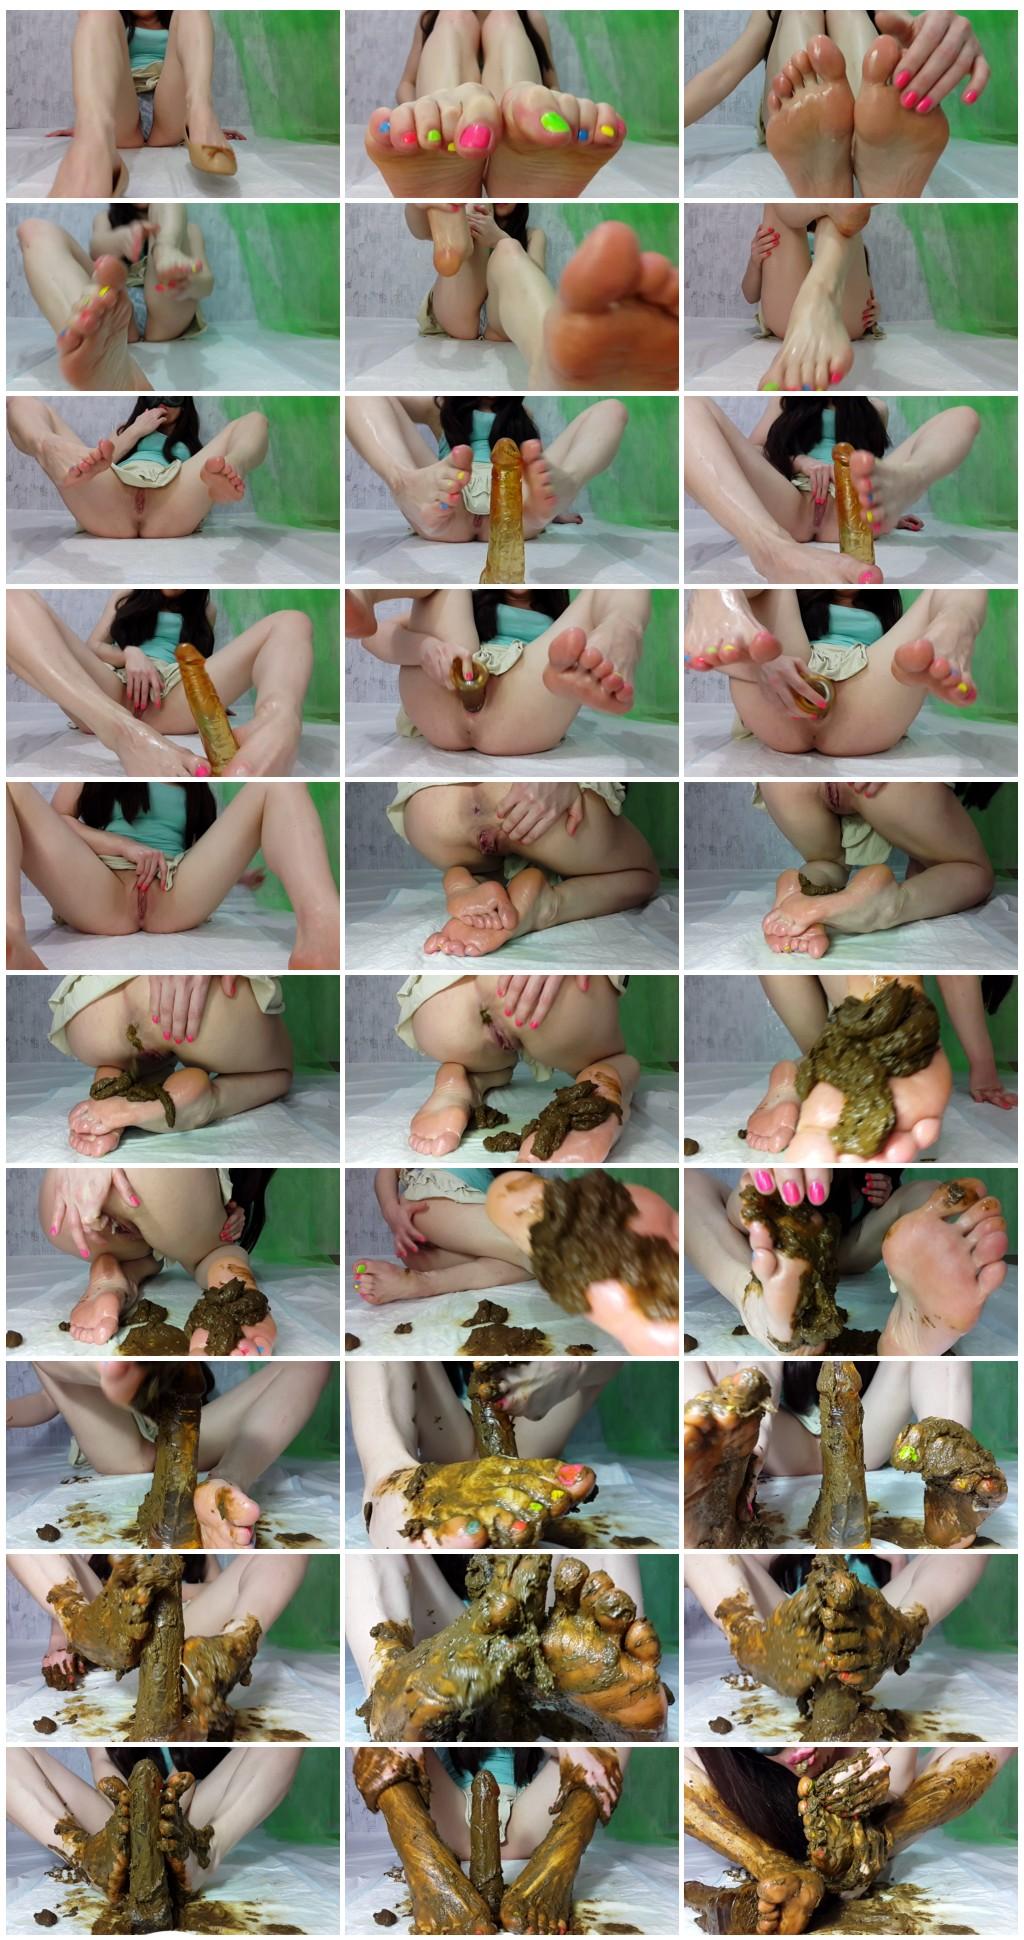 Scatshop.com Anna Coprofield My feet receive a portion of shit part 1 Dildo Poop Videos Scat Smearing thumb - [Scatshop com] Anna Coprofield - My feet receive a portion of shit part 1 [Dildo, Poop Videos, Scat, Smearing]